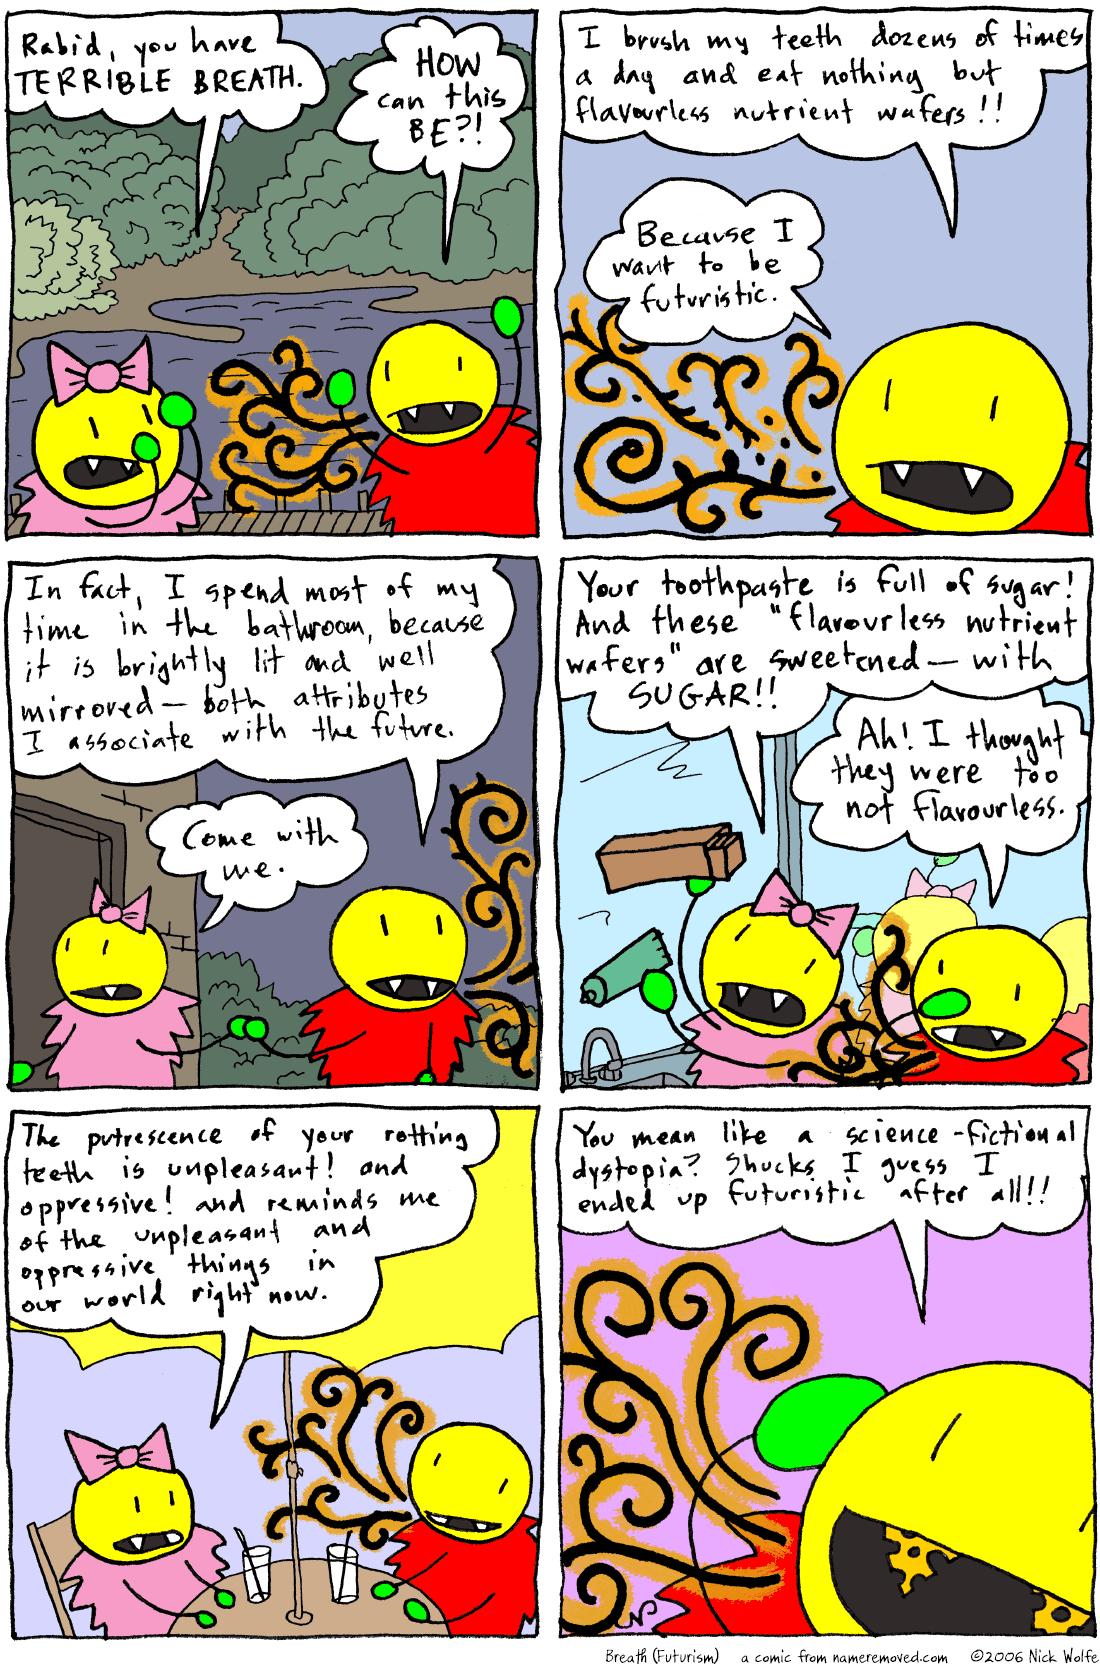 Breath (Futurism)